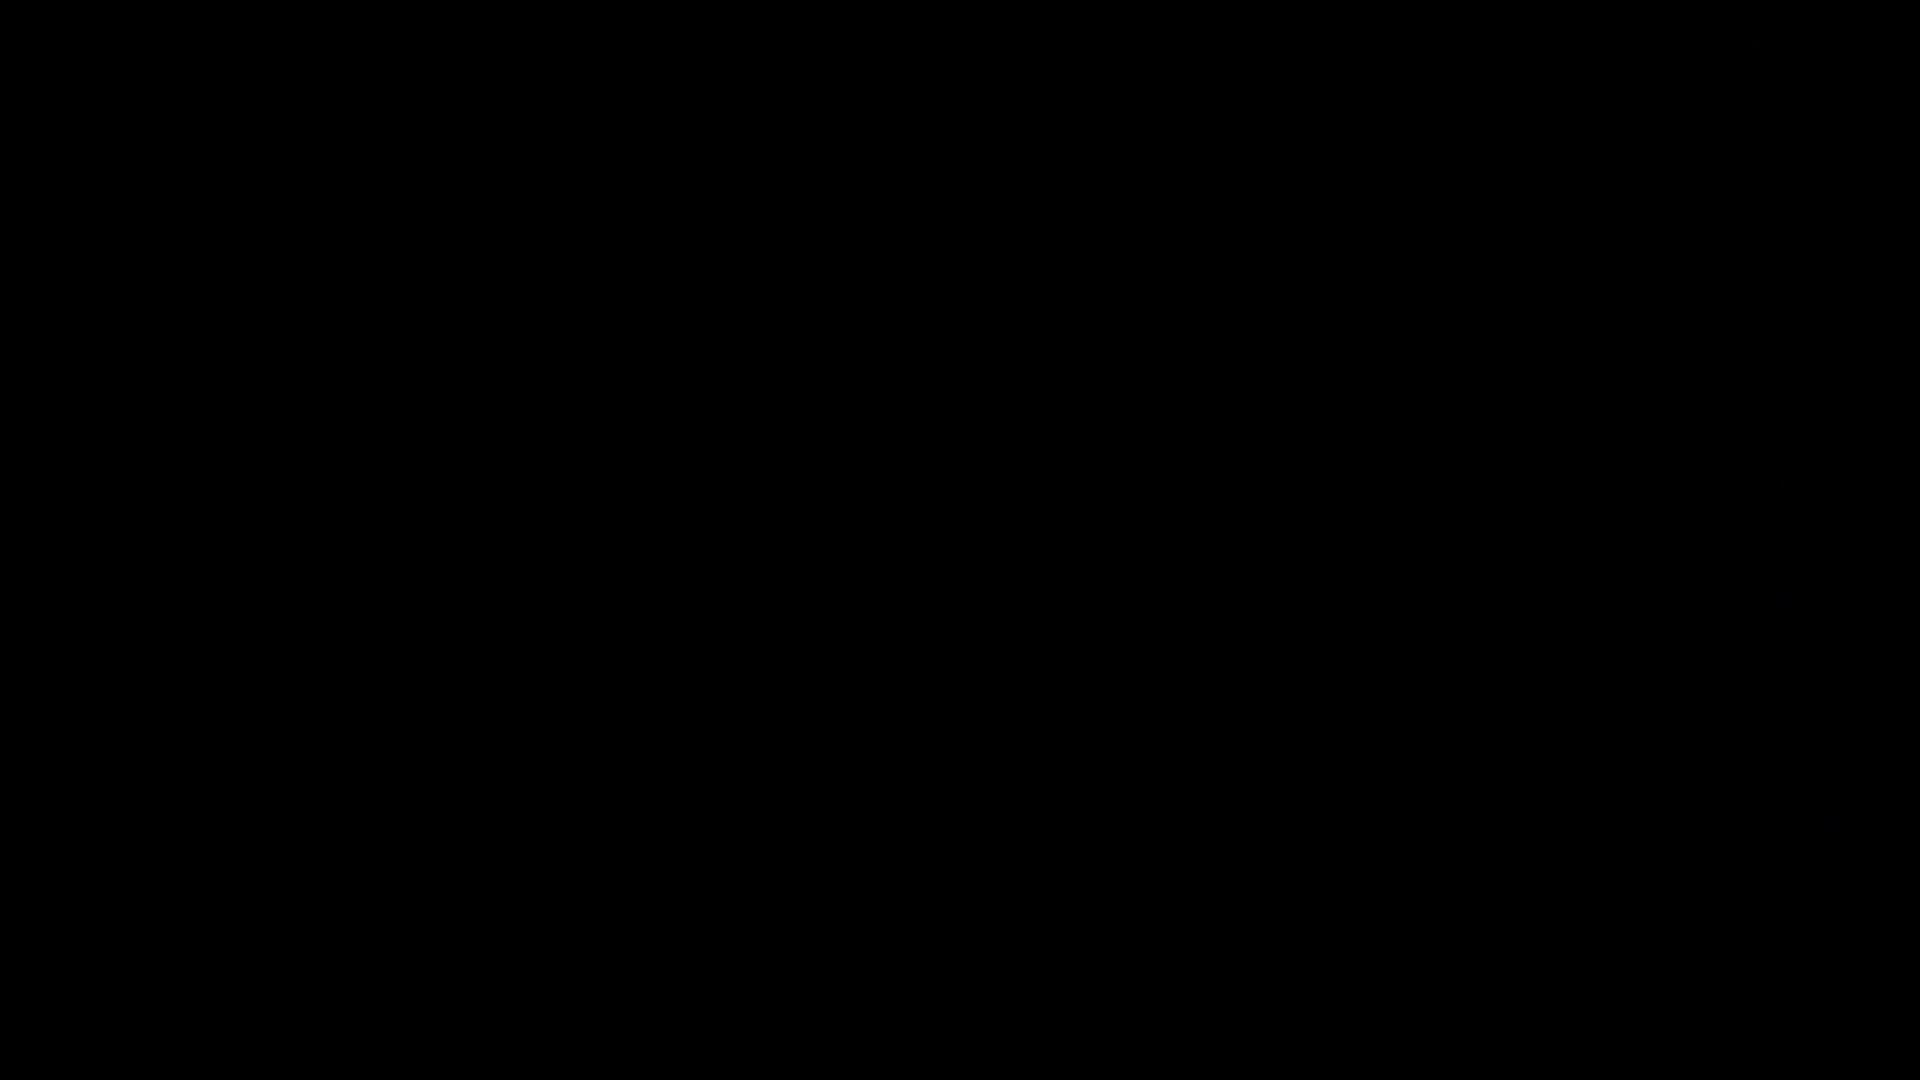 芸術大学ガチ潜入盗撮 JD盗撮 美女の洗面所の秘密 Vol.99 洗面所シーン 戯れ無修正画像 65画像 61